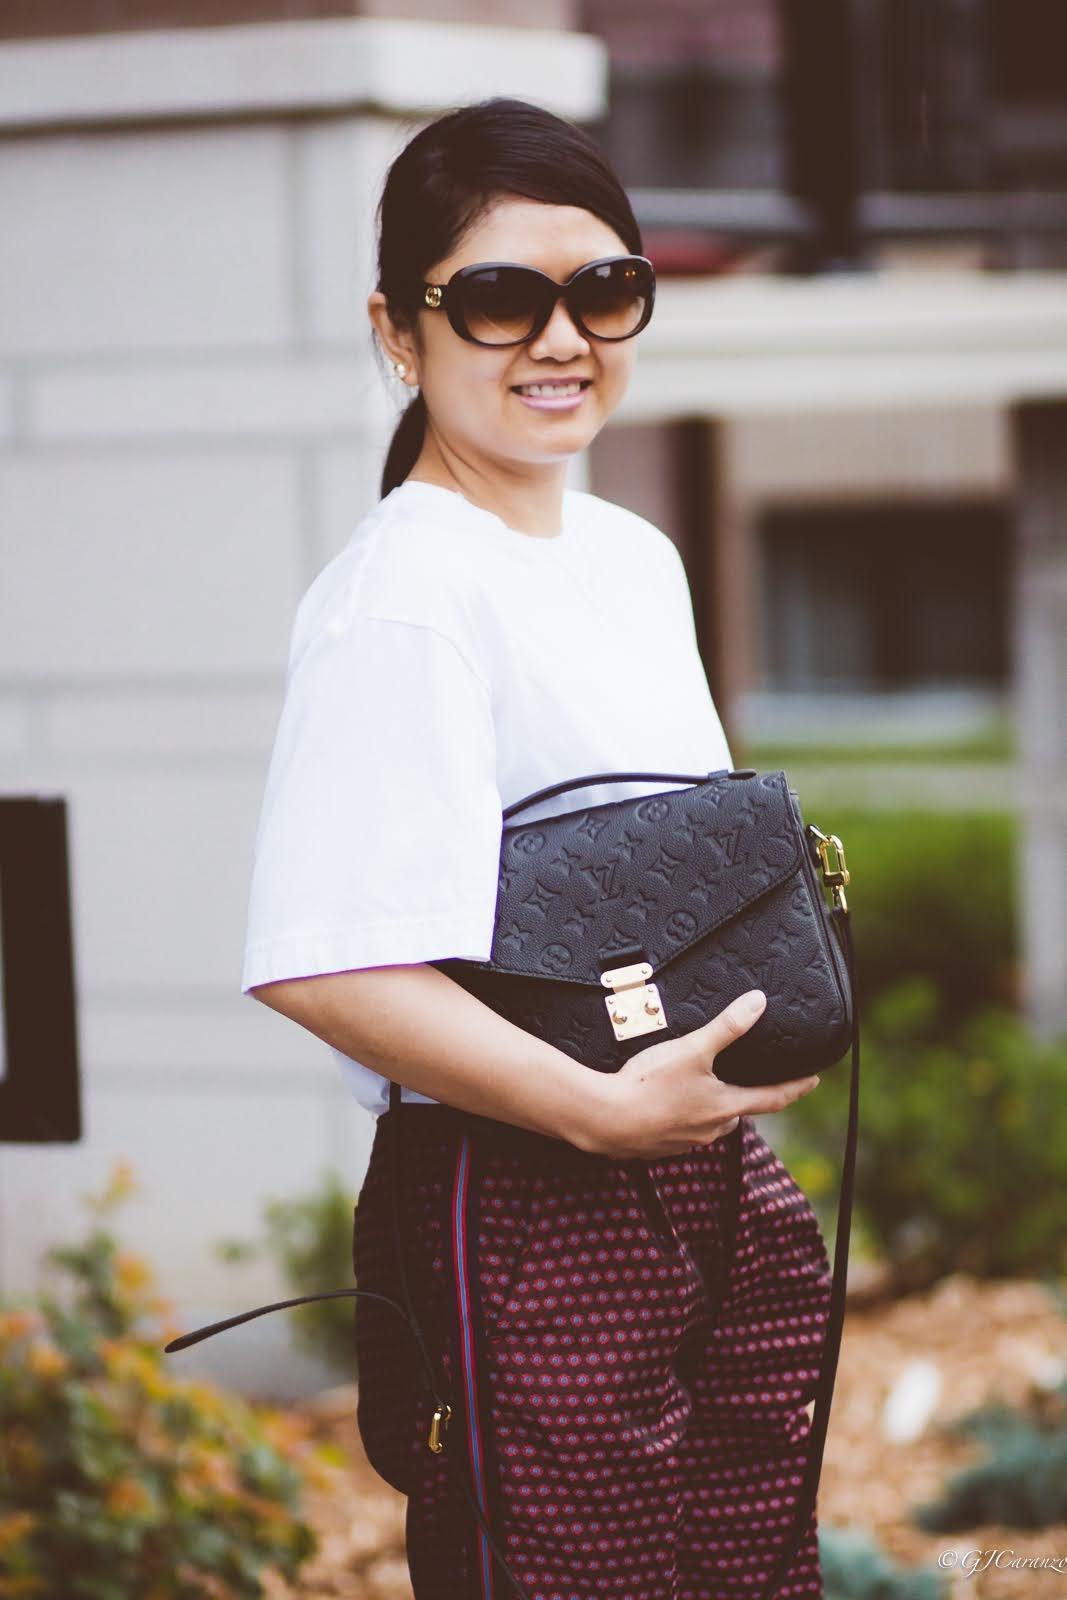 Zara pants with side stripes_uniqlo oversized white tee_coach bleeker sandals_gucci sunglasses_louis vuitton pochette metis in black empreinte leather